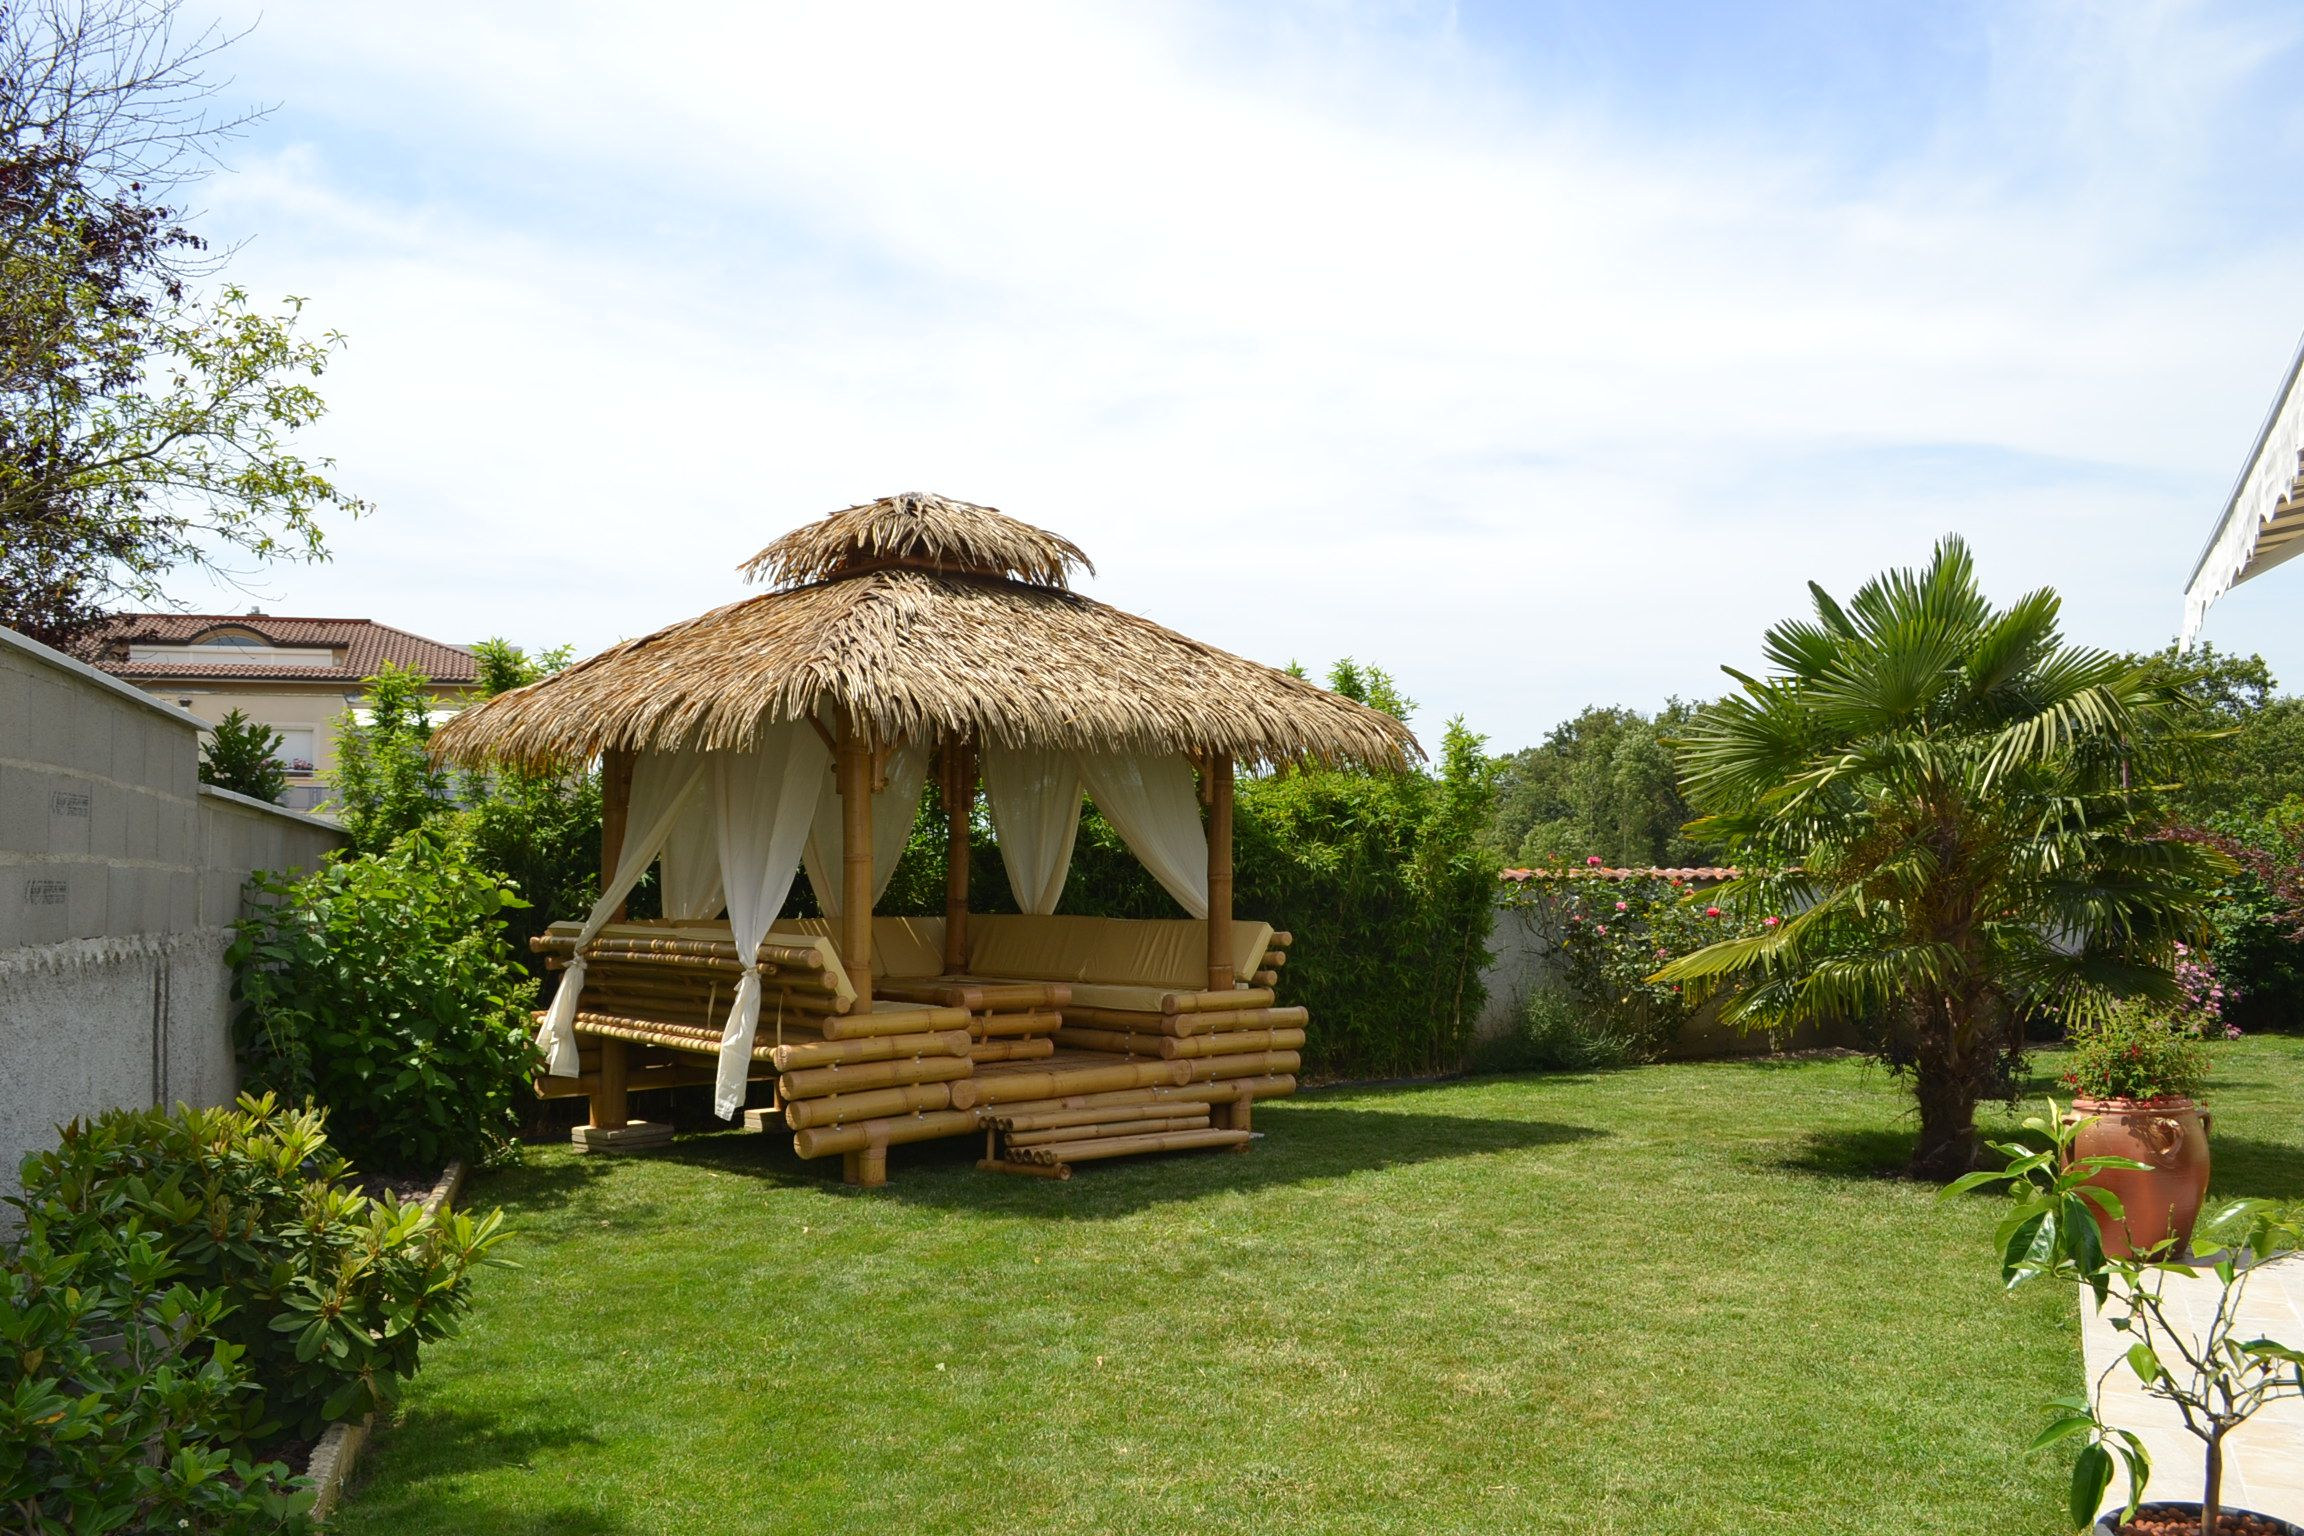 Épinglé Sur Gazebo Bambou, Paillote Bambou Et Bar En Bambou concernant Paillote Jardin